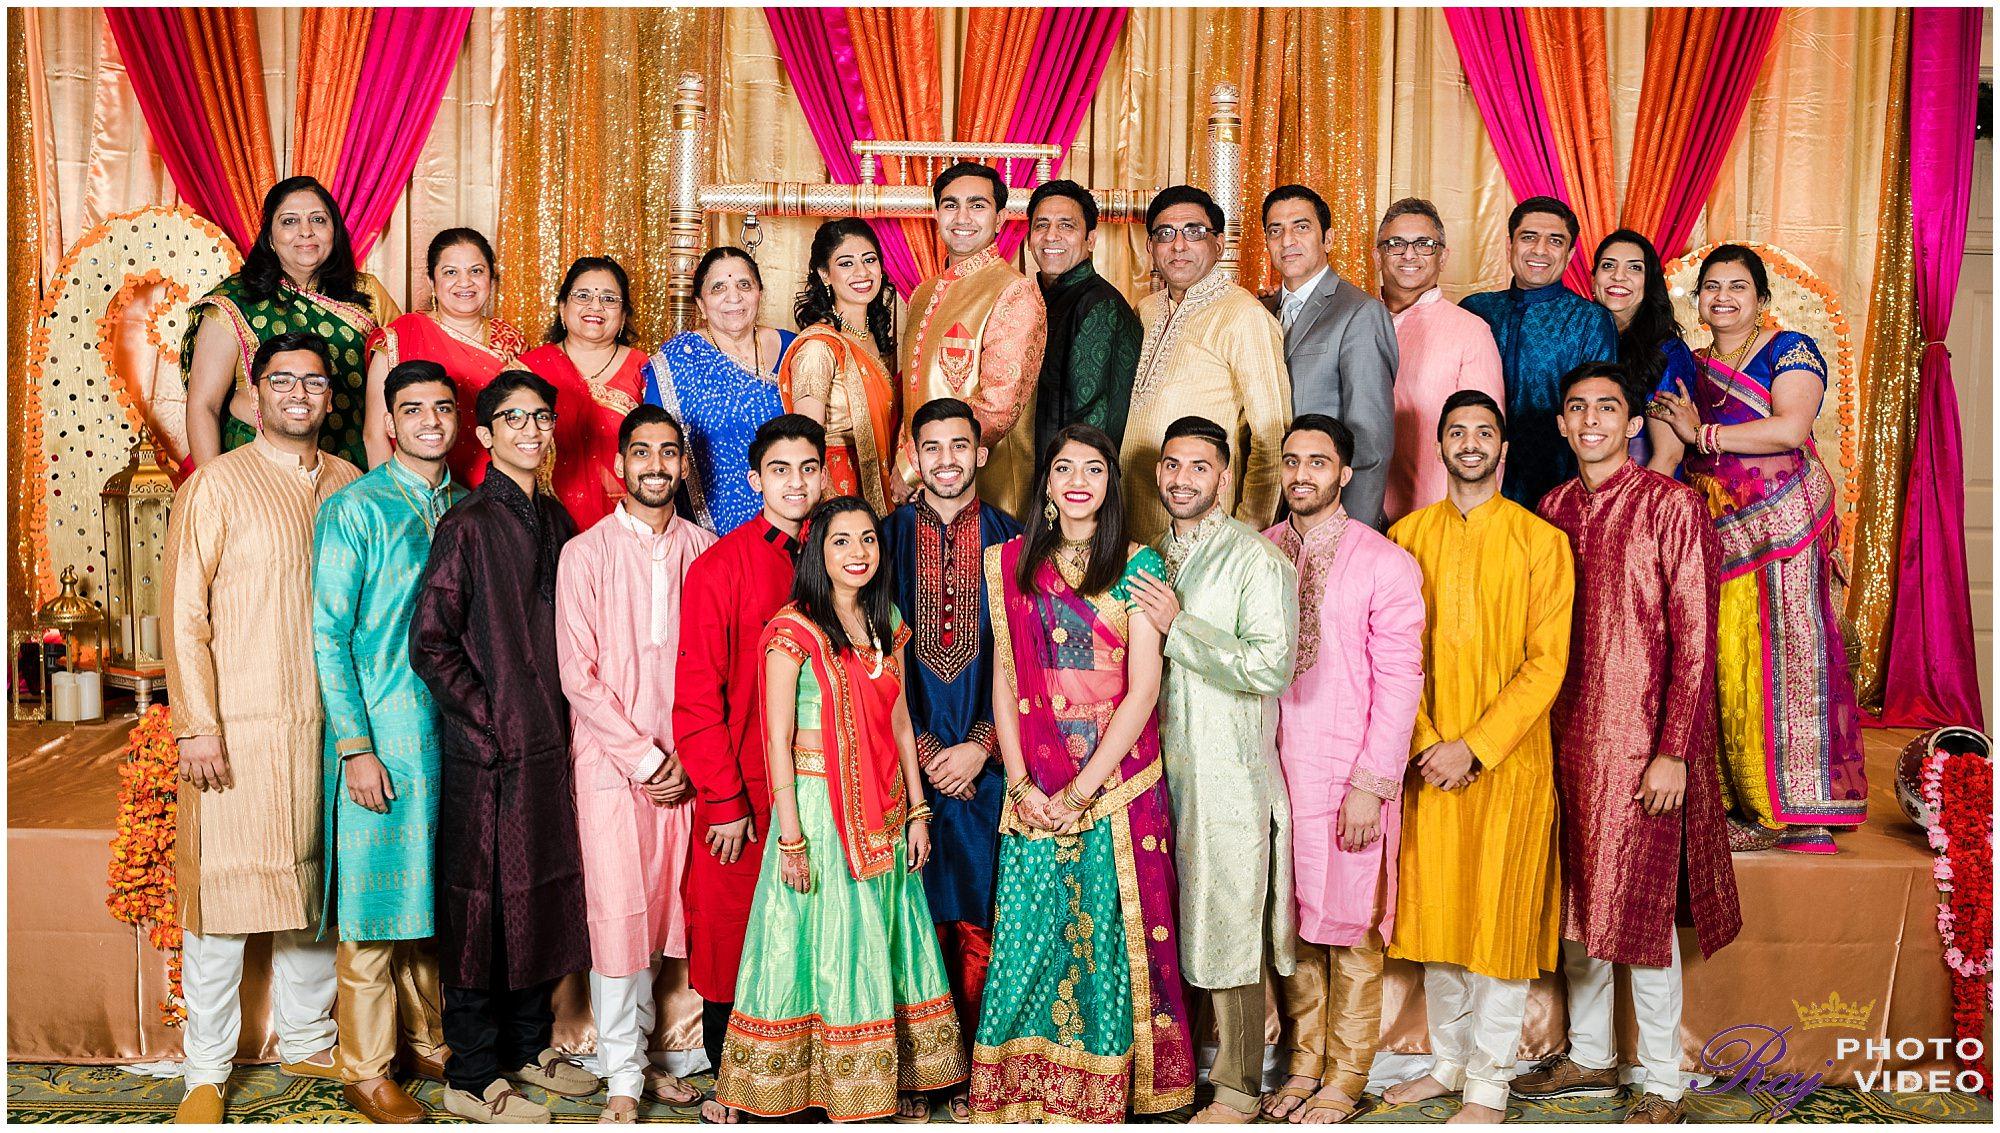 Founders-Inn-and-Spa-Virginia-Beach-VA-Indian-Wedding-Harini-Vivek-11.jpg